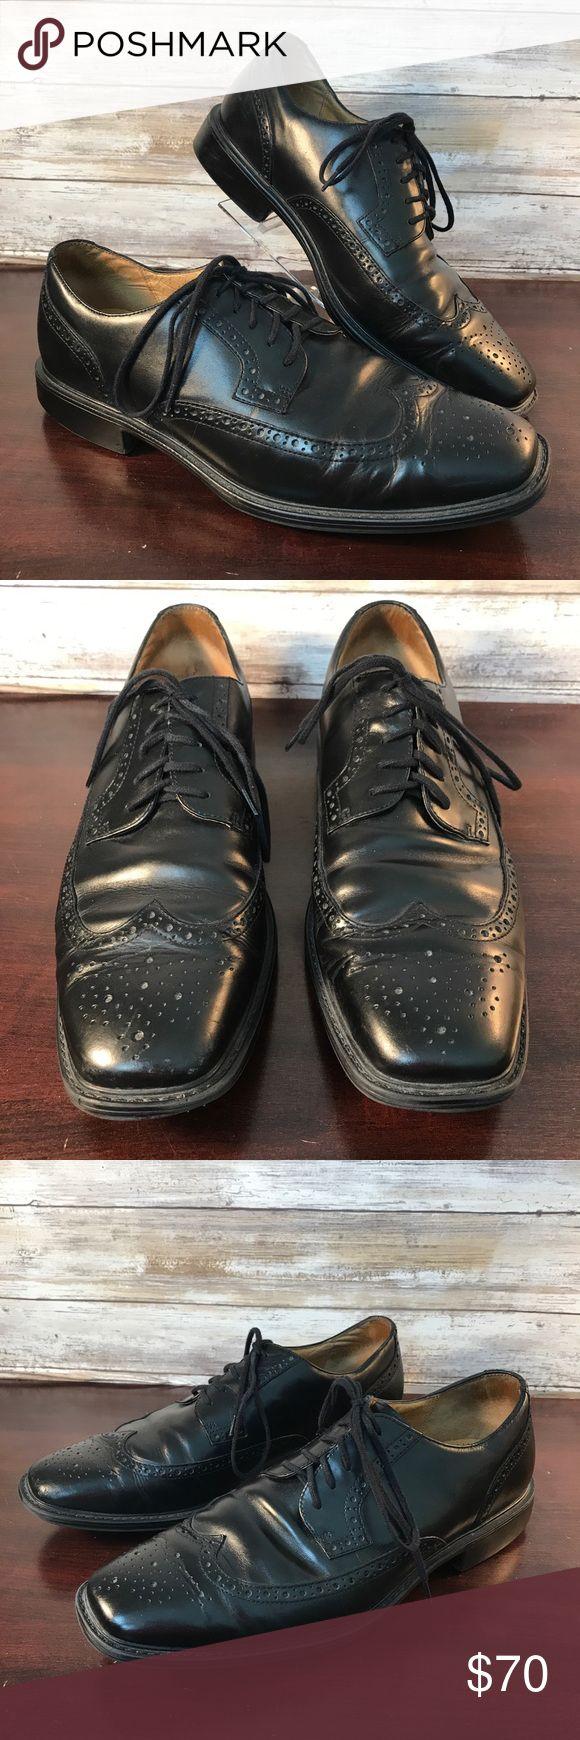 Cole Haan City Mens Size 11M Black Wingtip Cole Haan City Mens Size 11M Black Wingtip Oxford Leather Dress Shoes Lace Up  Great condition as shown Cole Haan Shoes Oxfords & Derbys